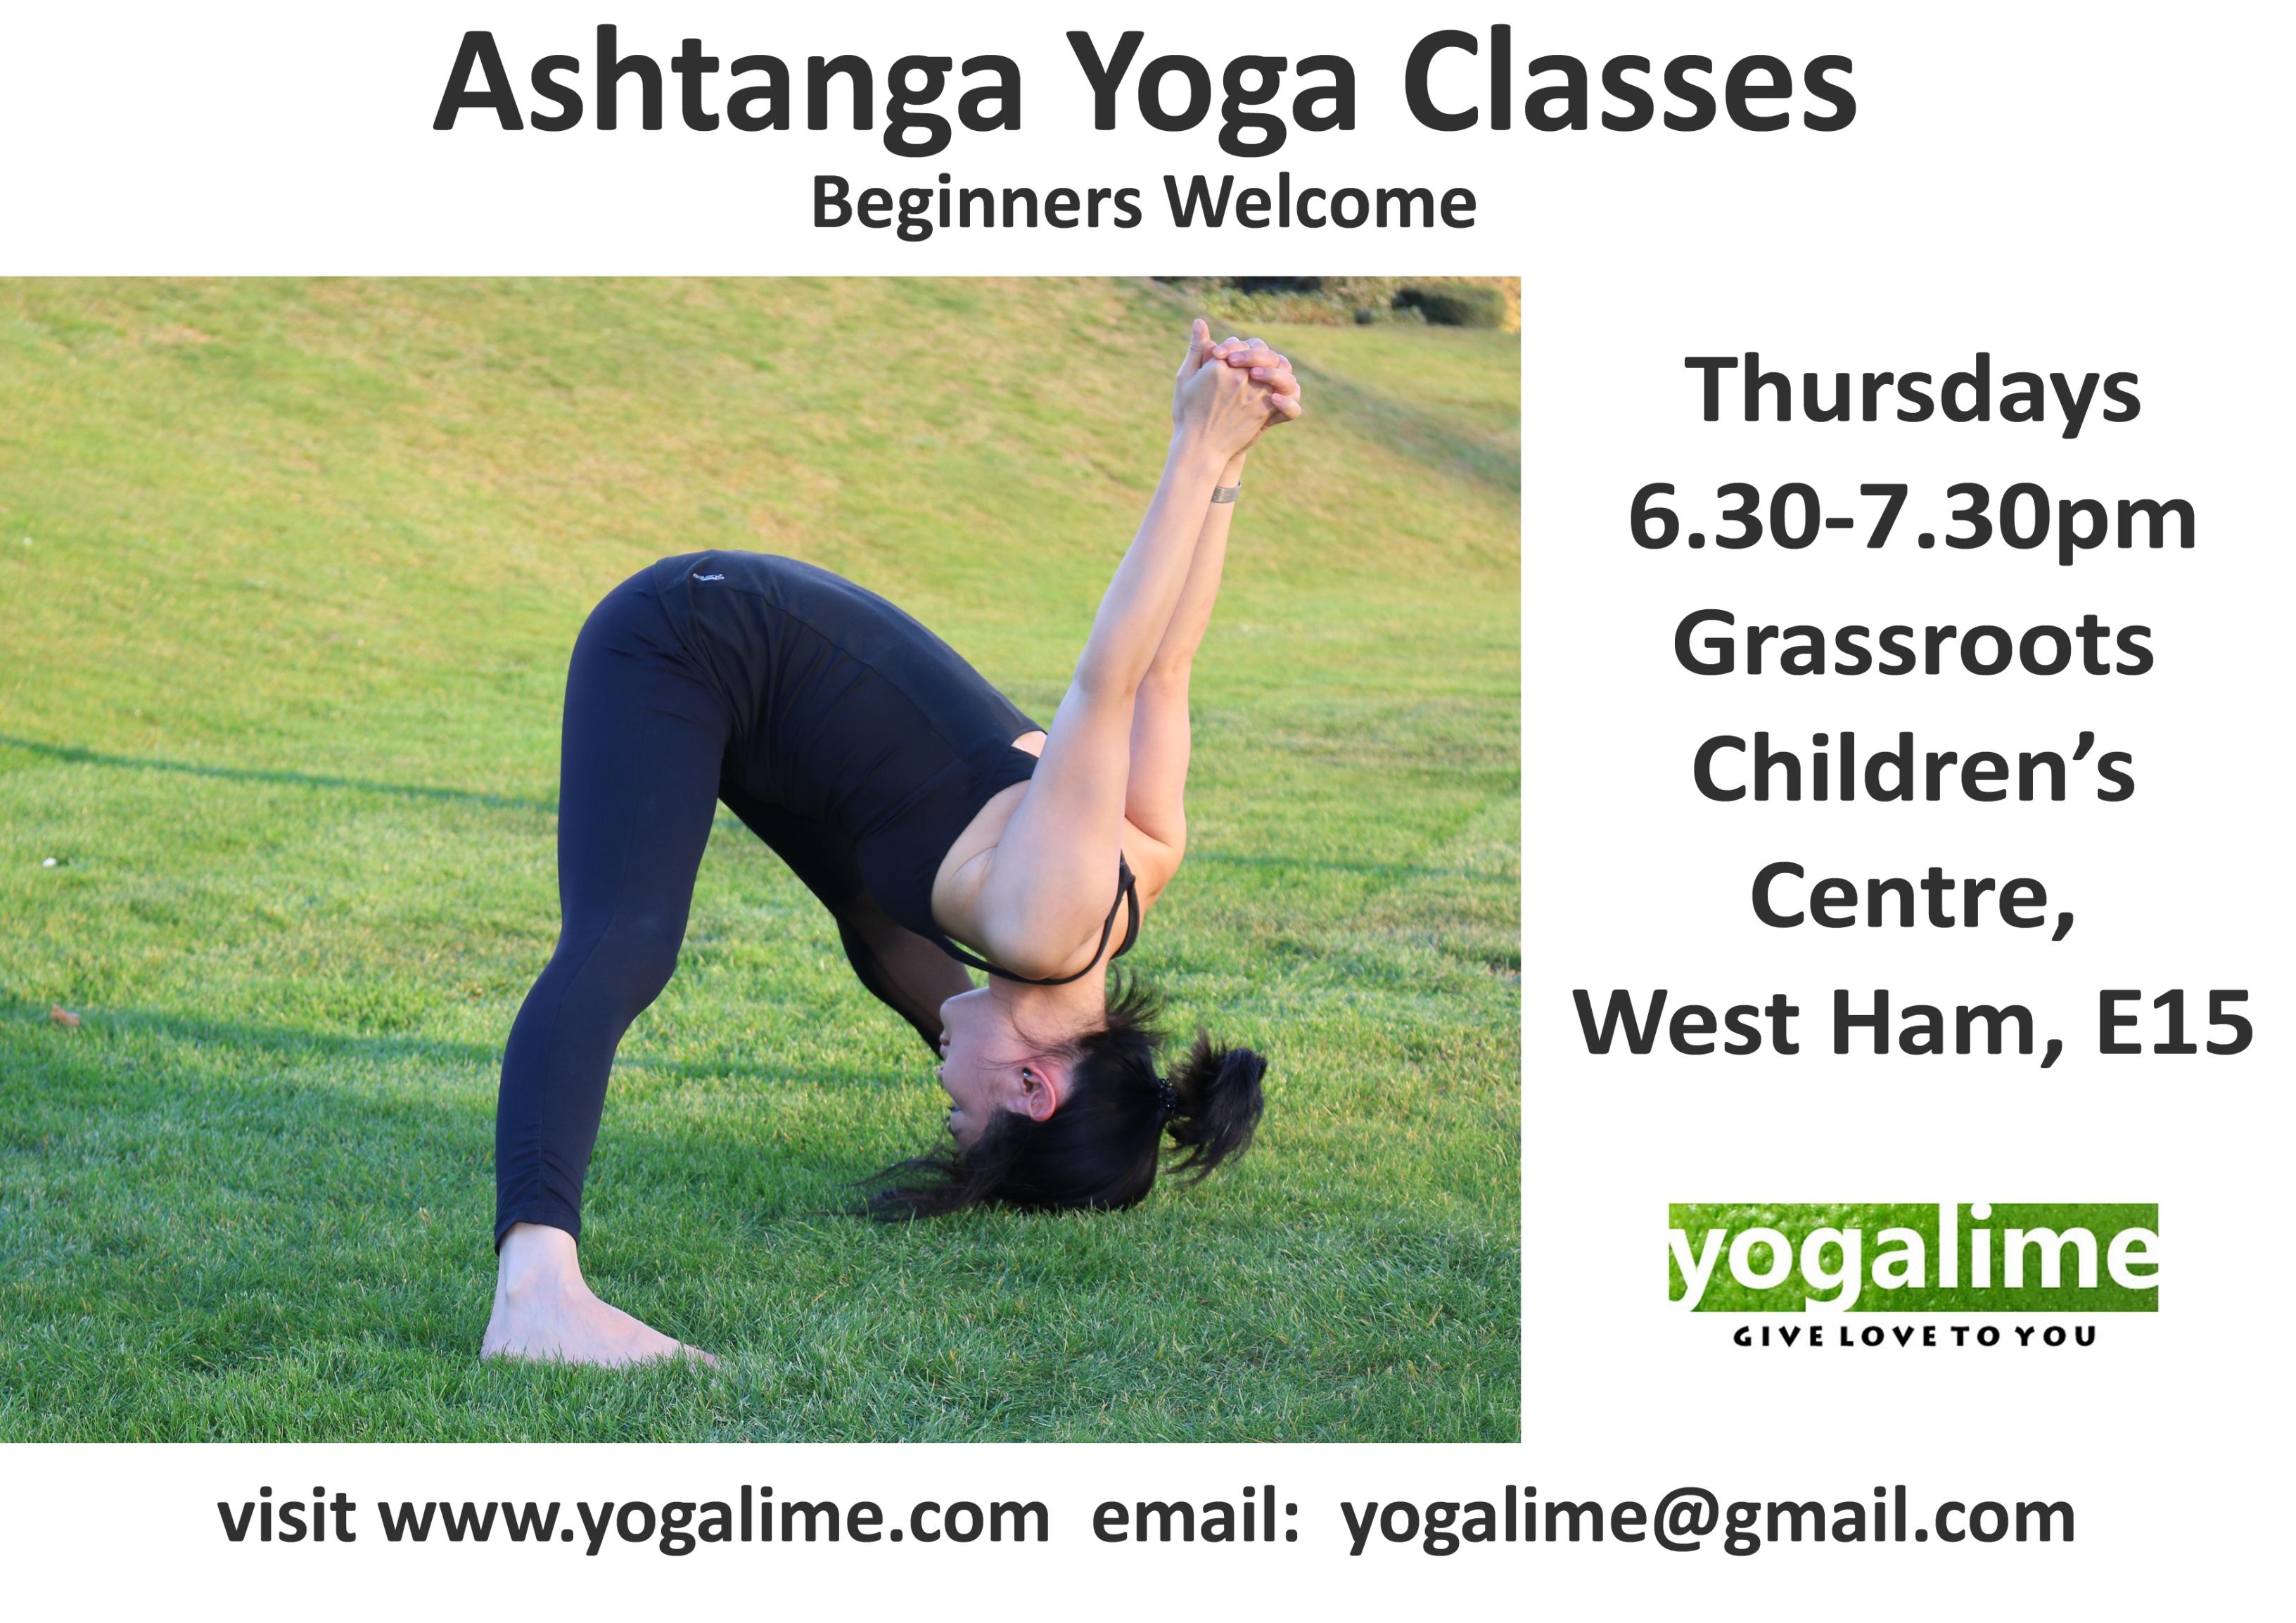 Ashtanga yoga in West Ham, East London, yogalime